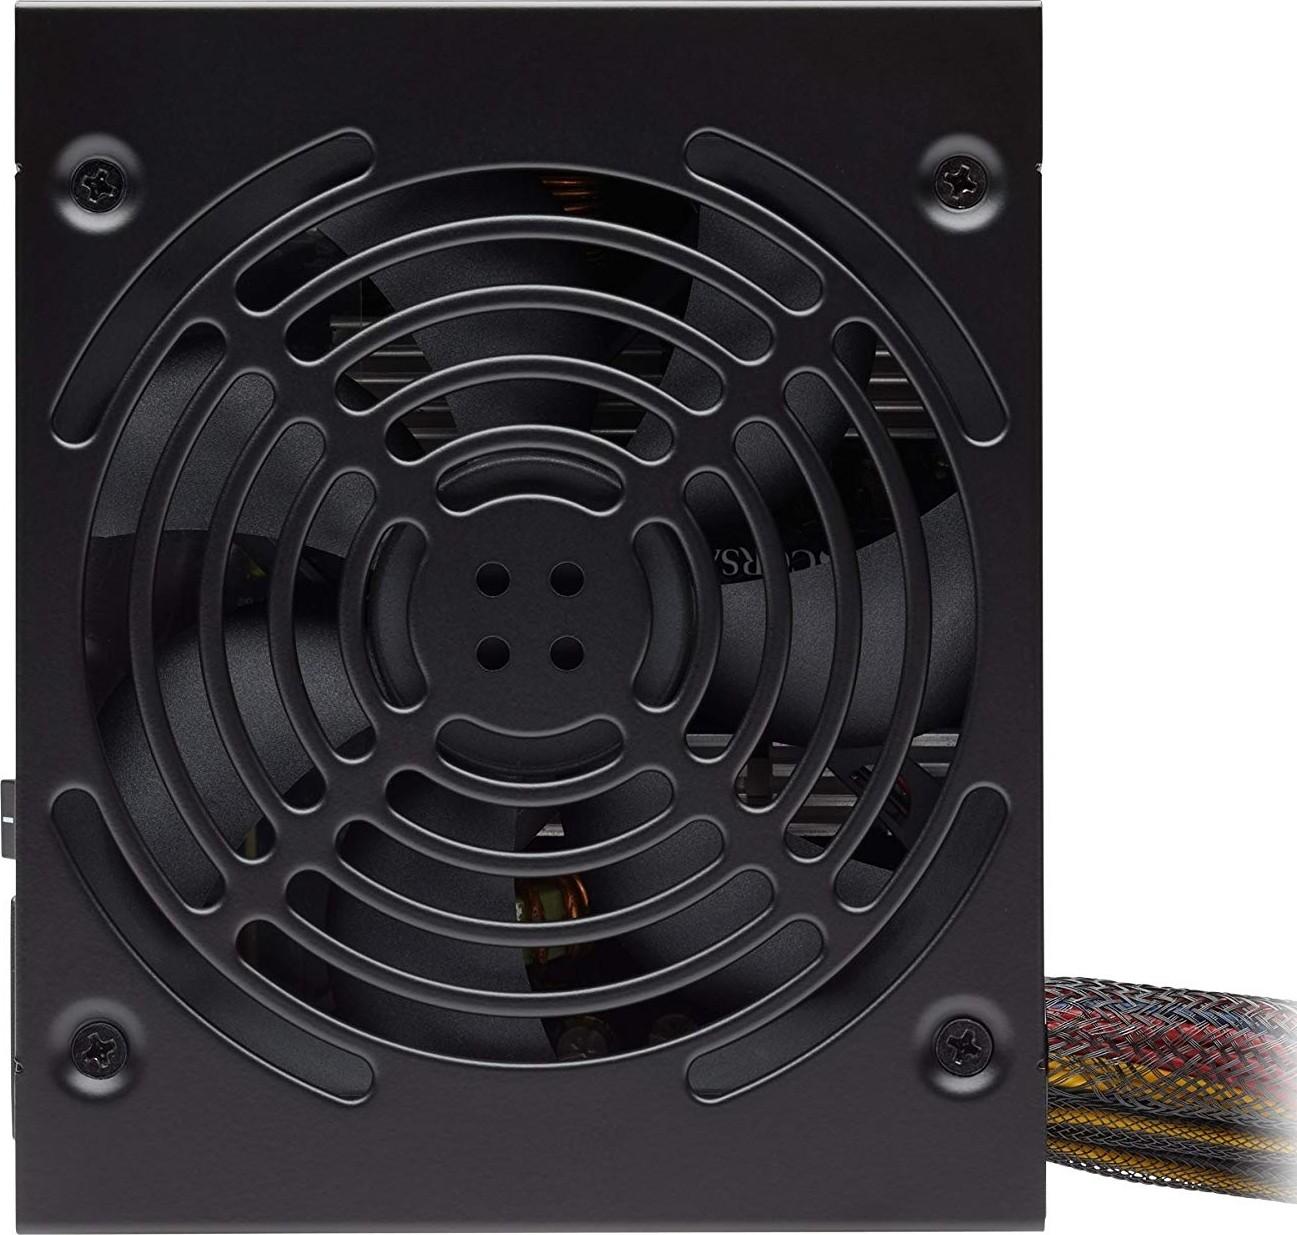 Corsair VS650 650 Watts ATX12V V2 31 Power Supply | CP-9020098-UK /  CP-9020172-UK